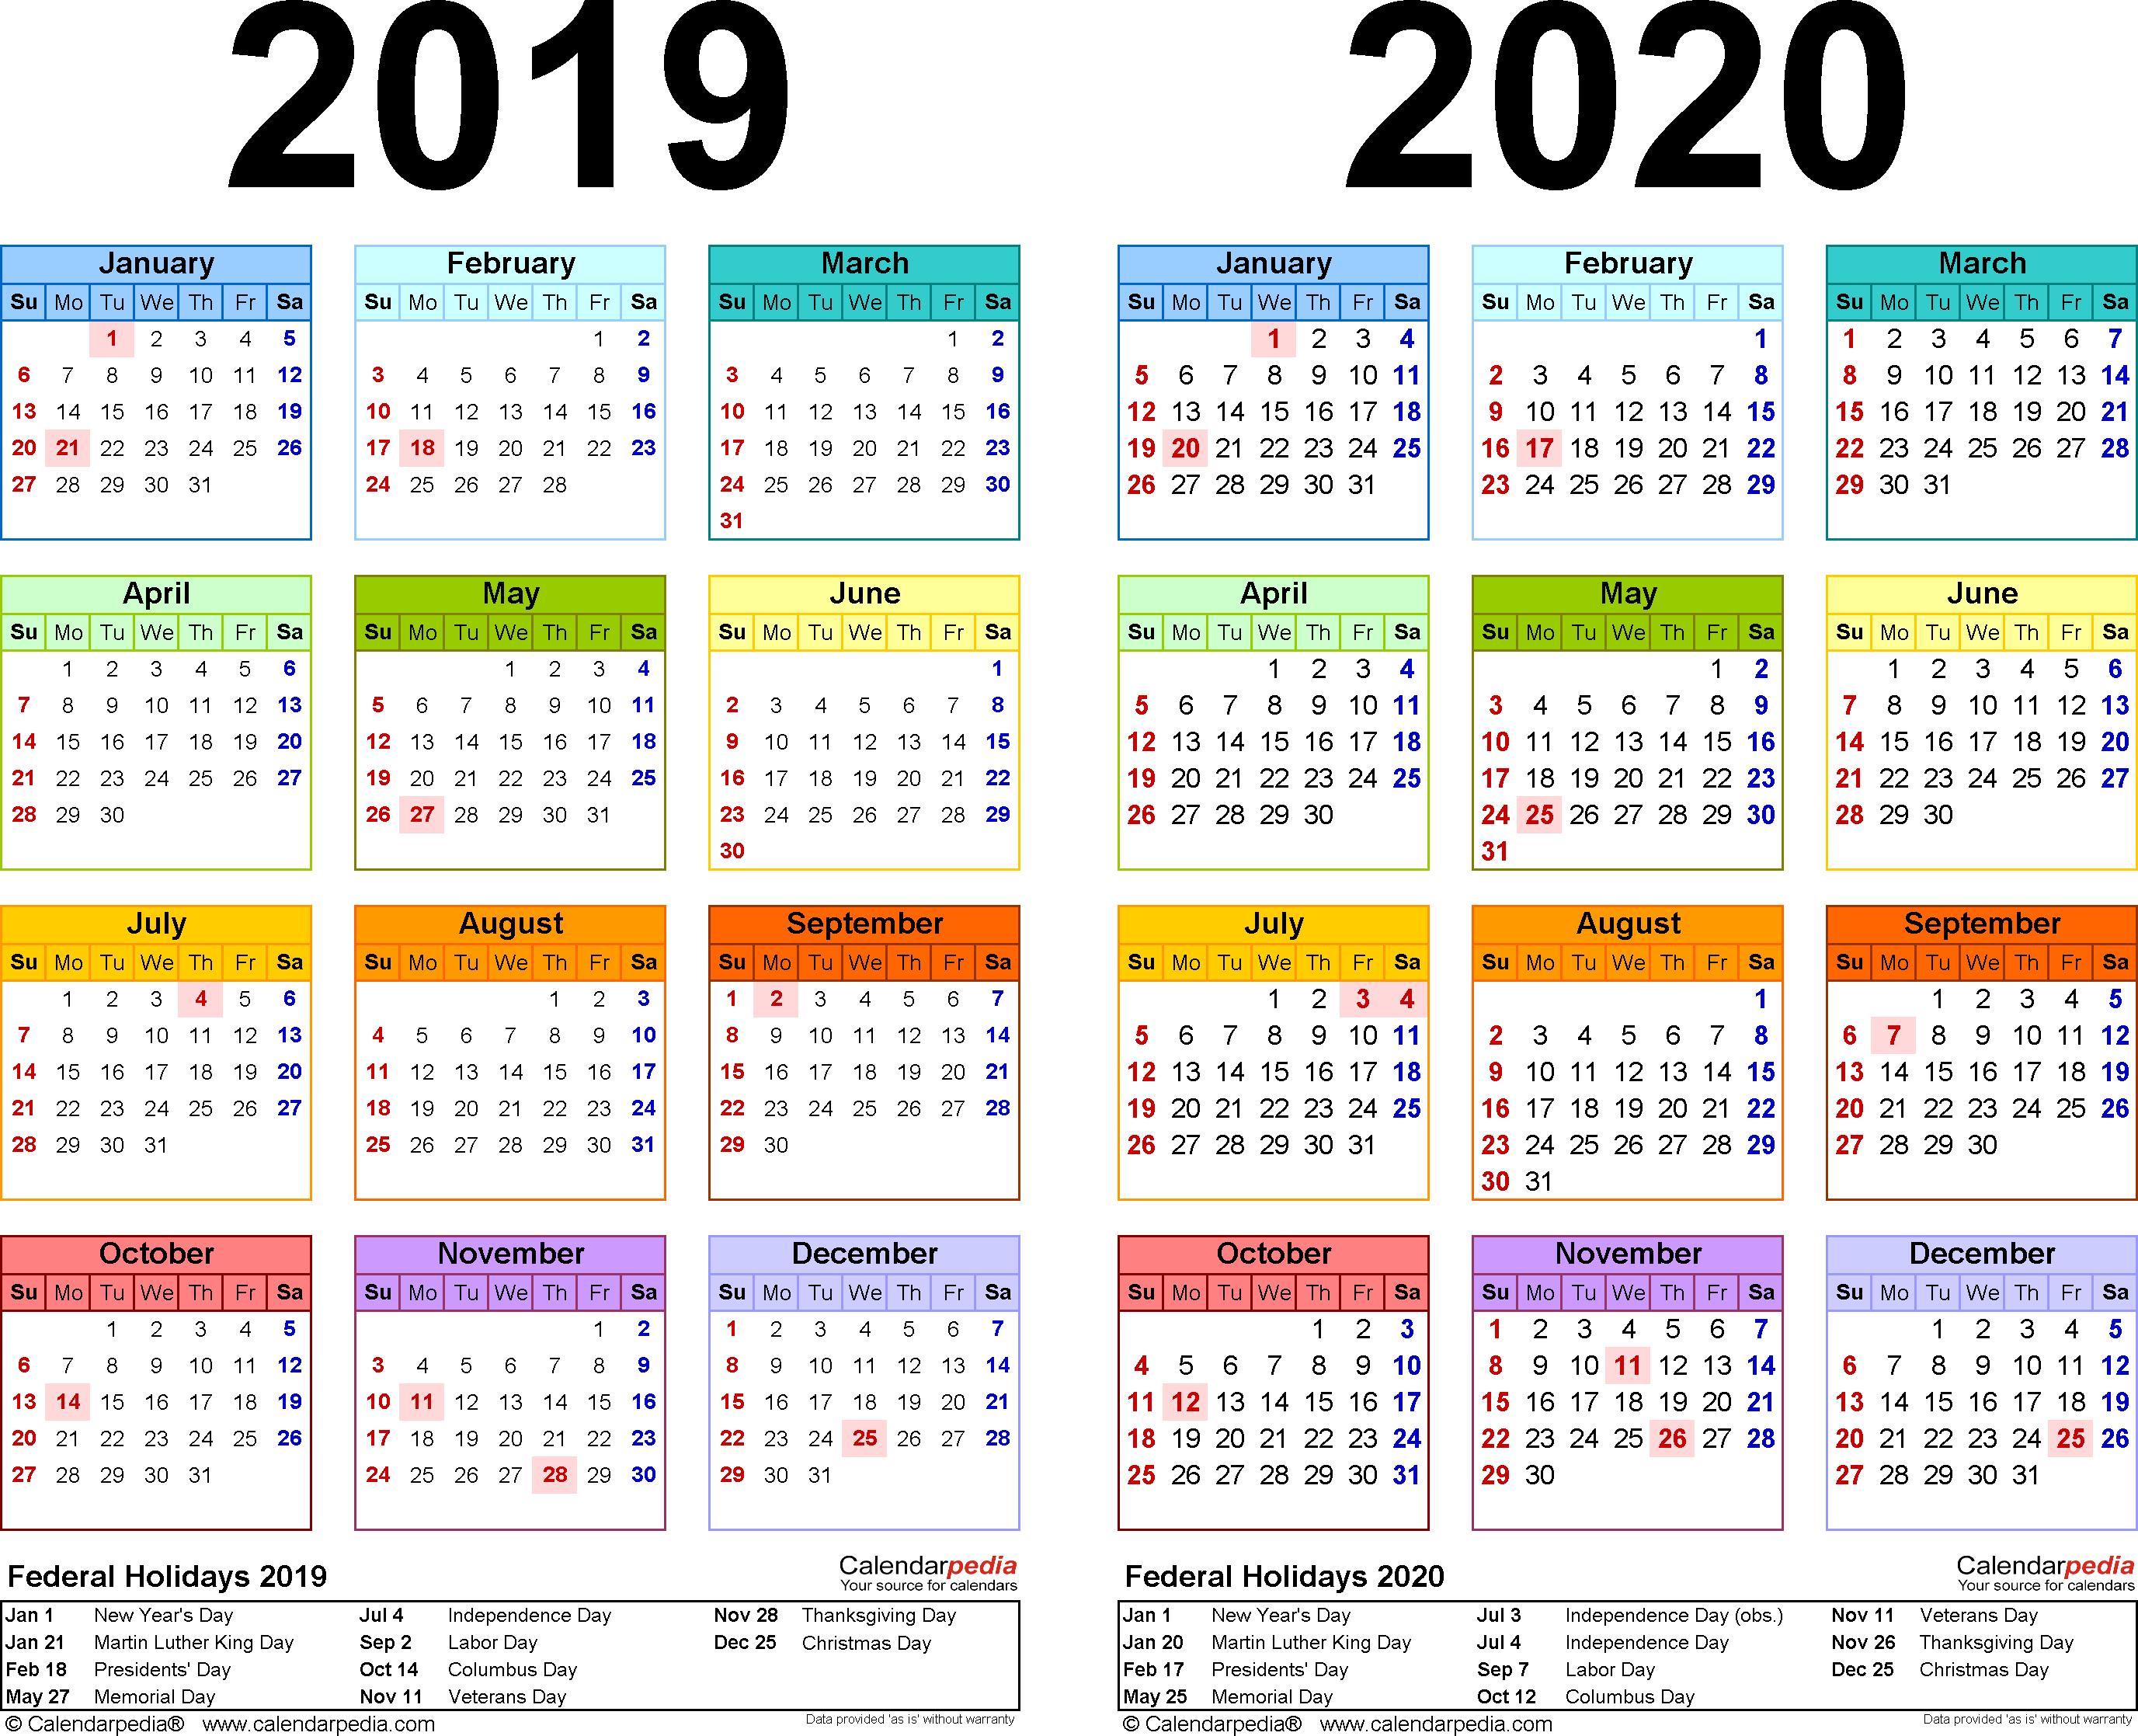 2019-2020 Calendar - Free Printable Two-Year Word Calendars regarding 2020 Calander To Write On